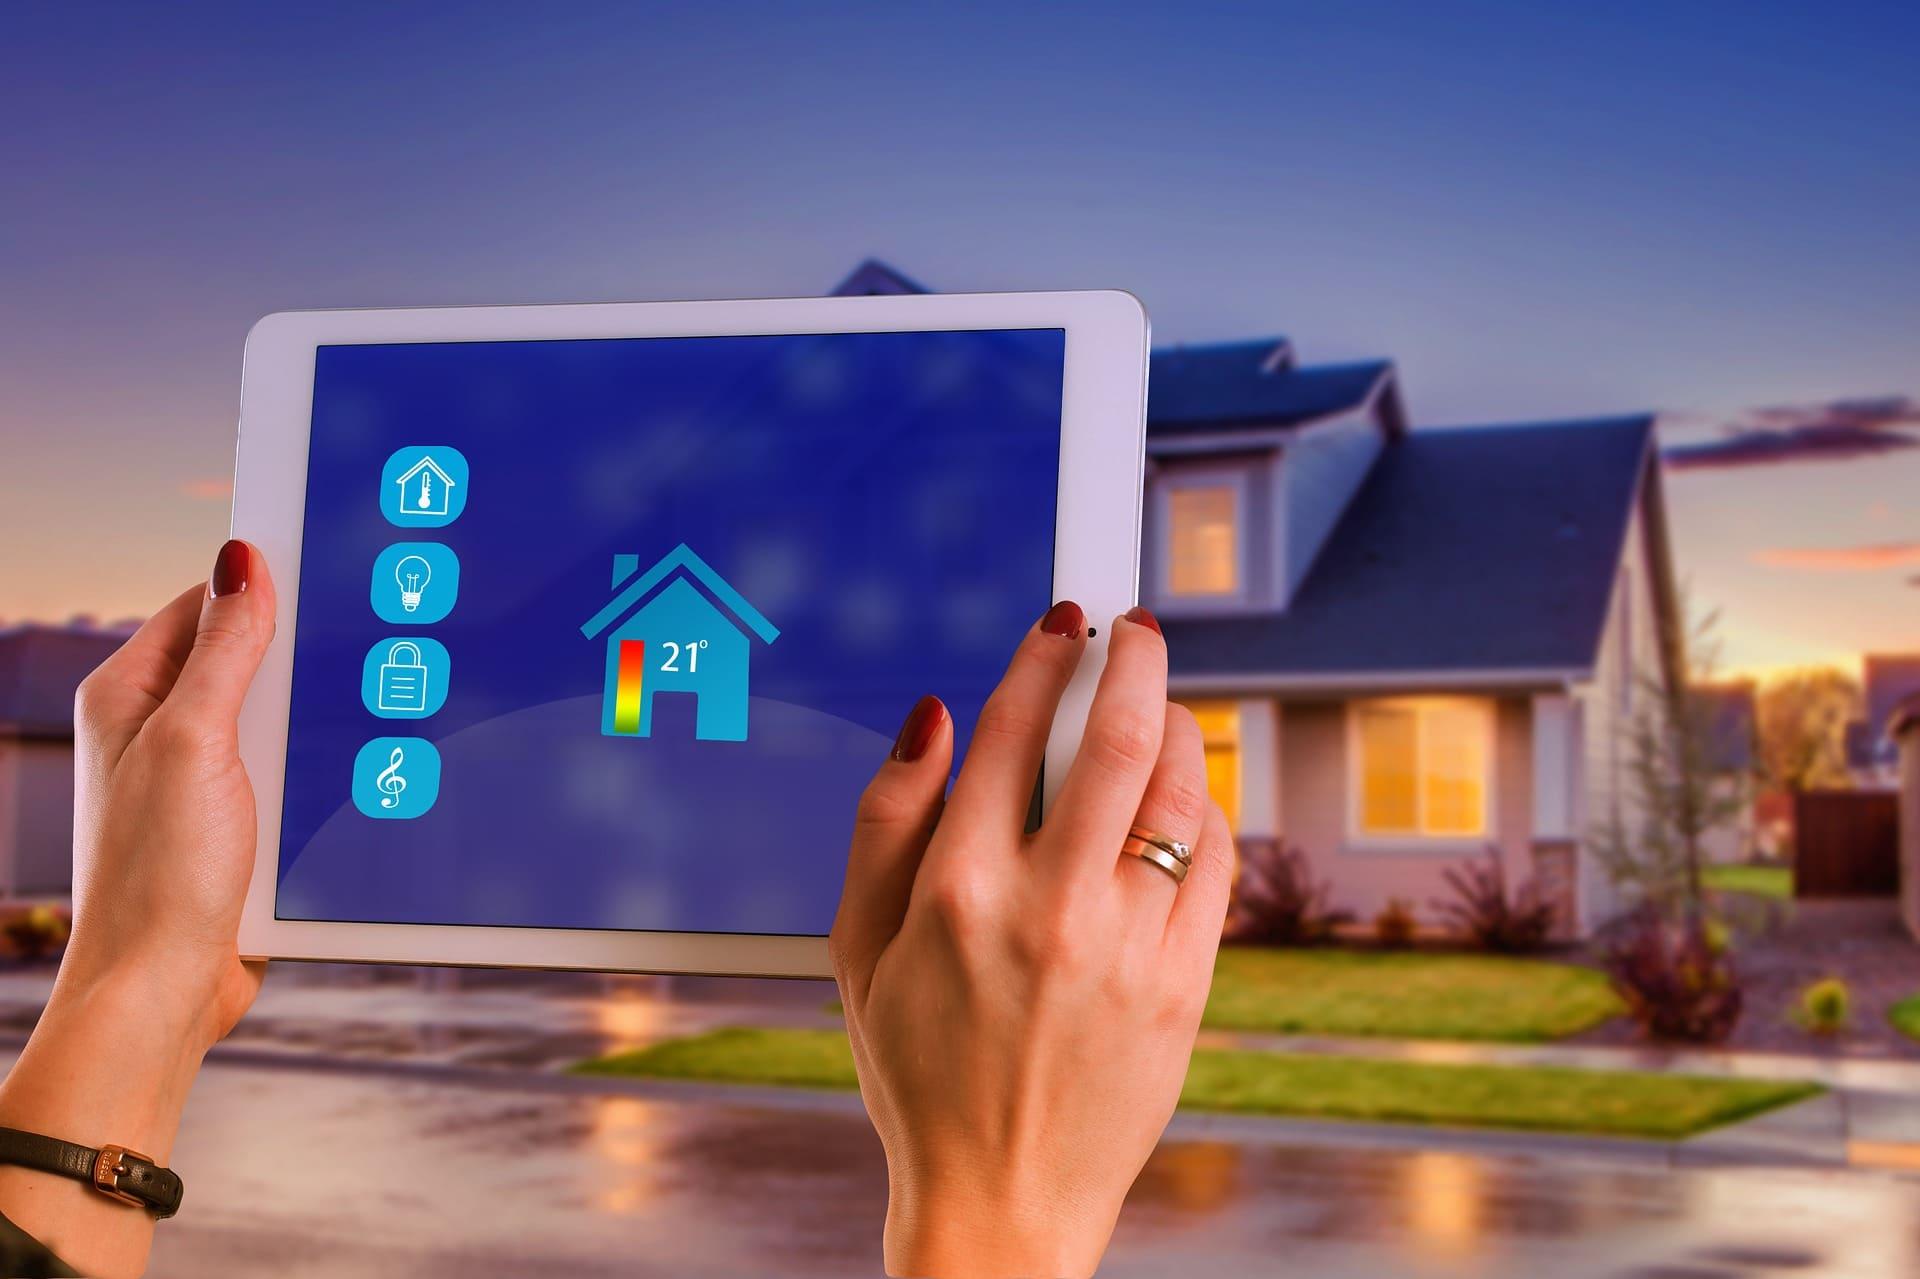 neubau_smart-home-3920905_1920_pixabay